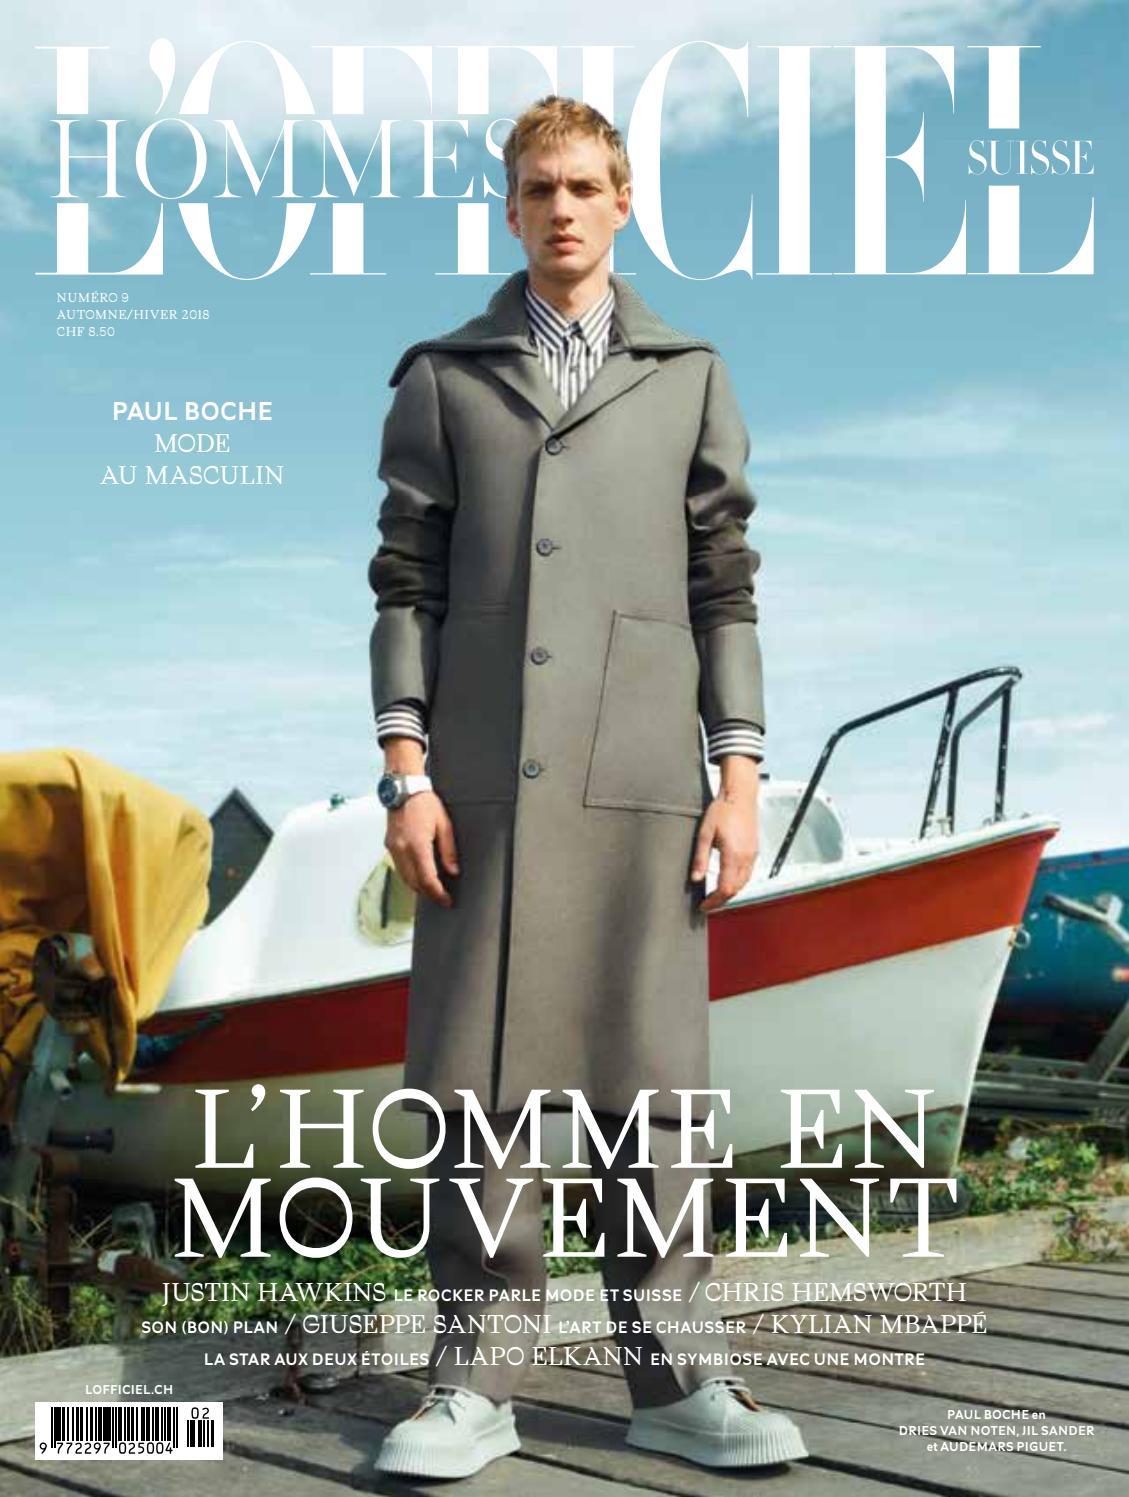 9 Automne/Hiver 2018 FR by L'Officiel Schweiz/Suisse - issuu